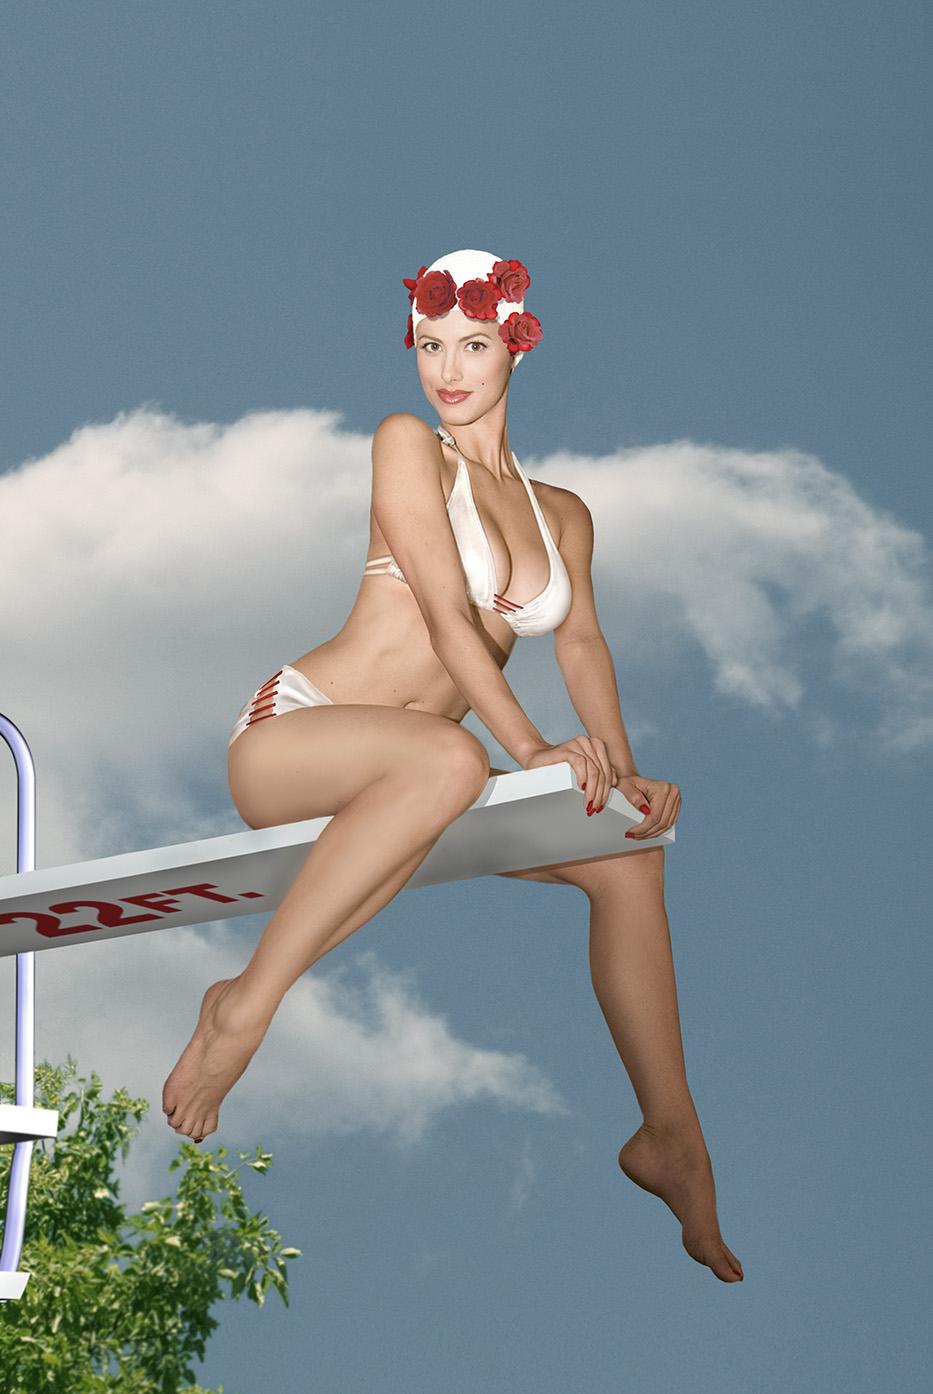 Rayna_diving board.jpg